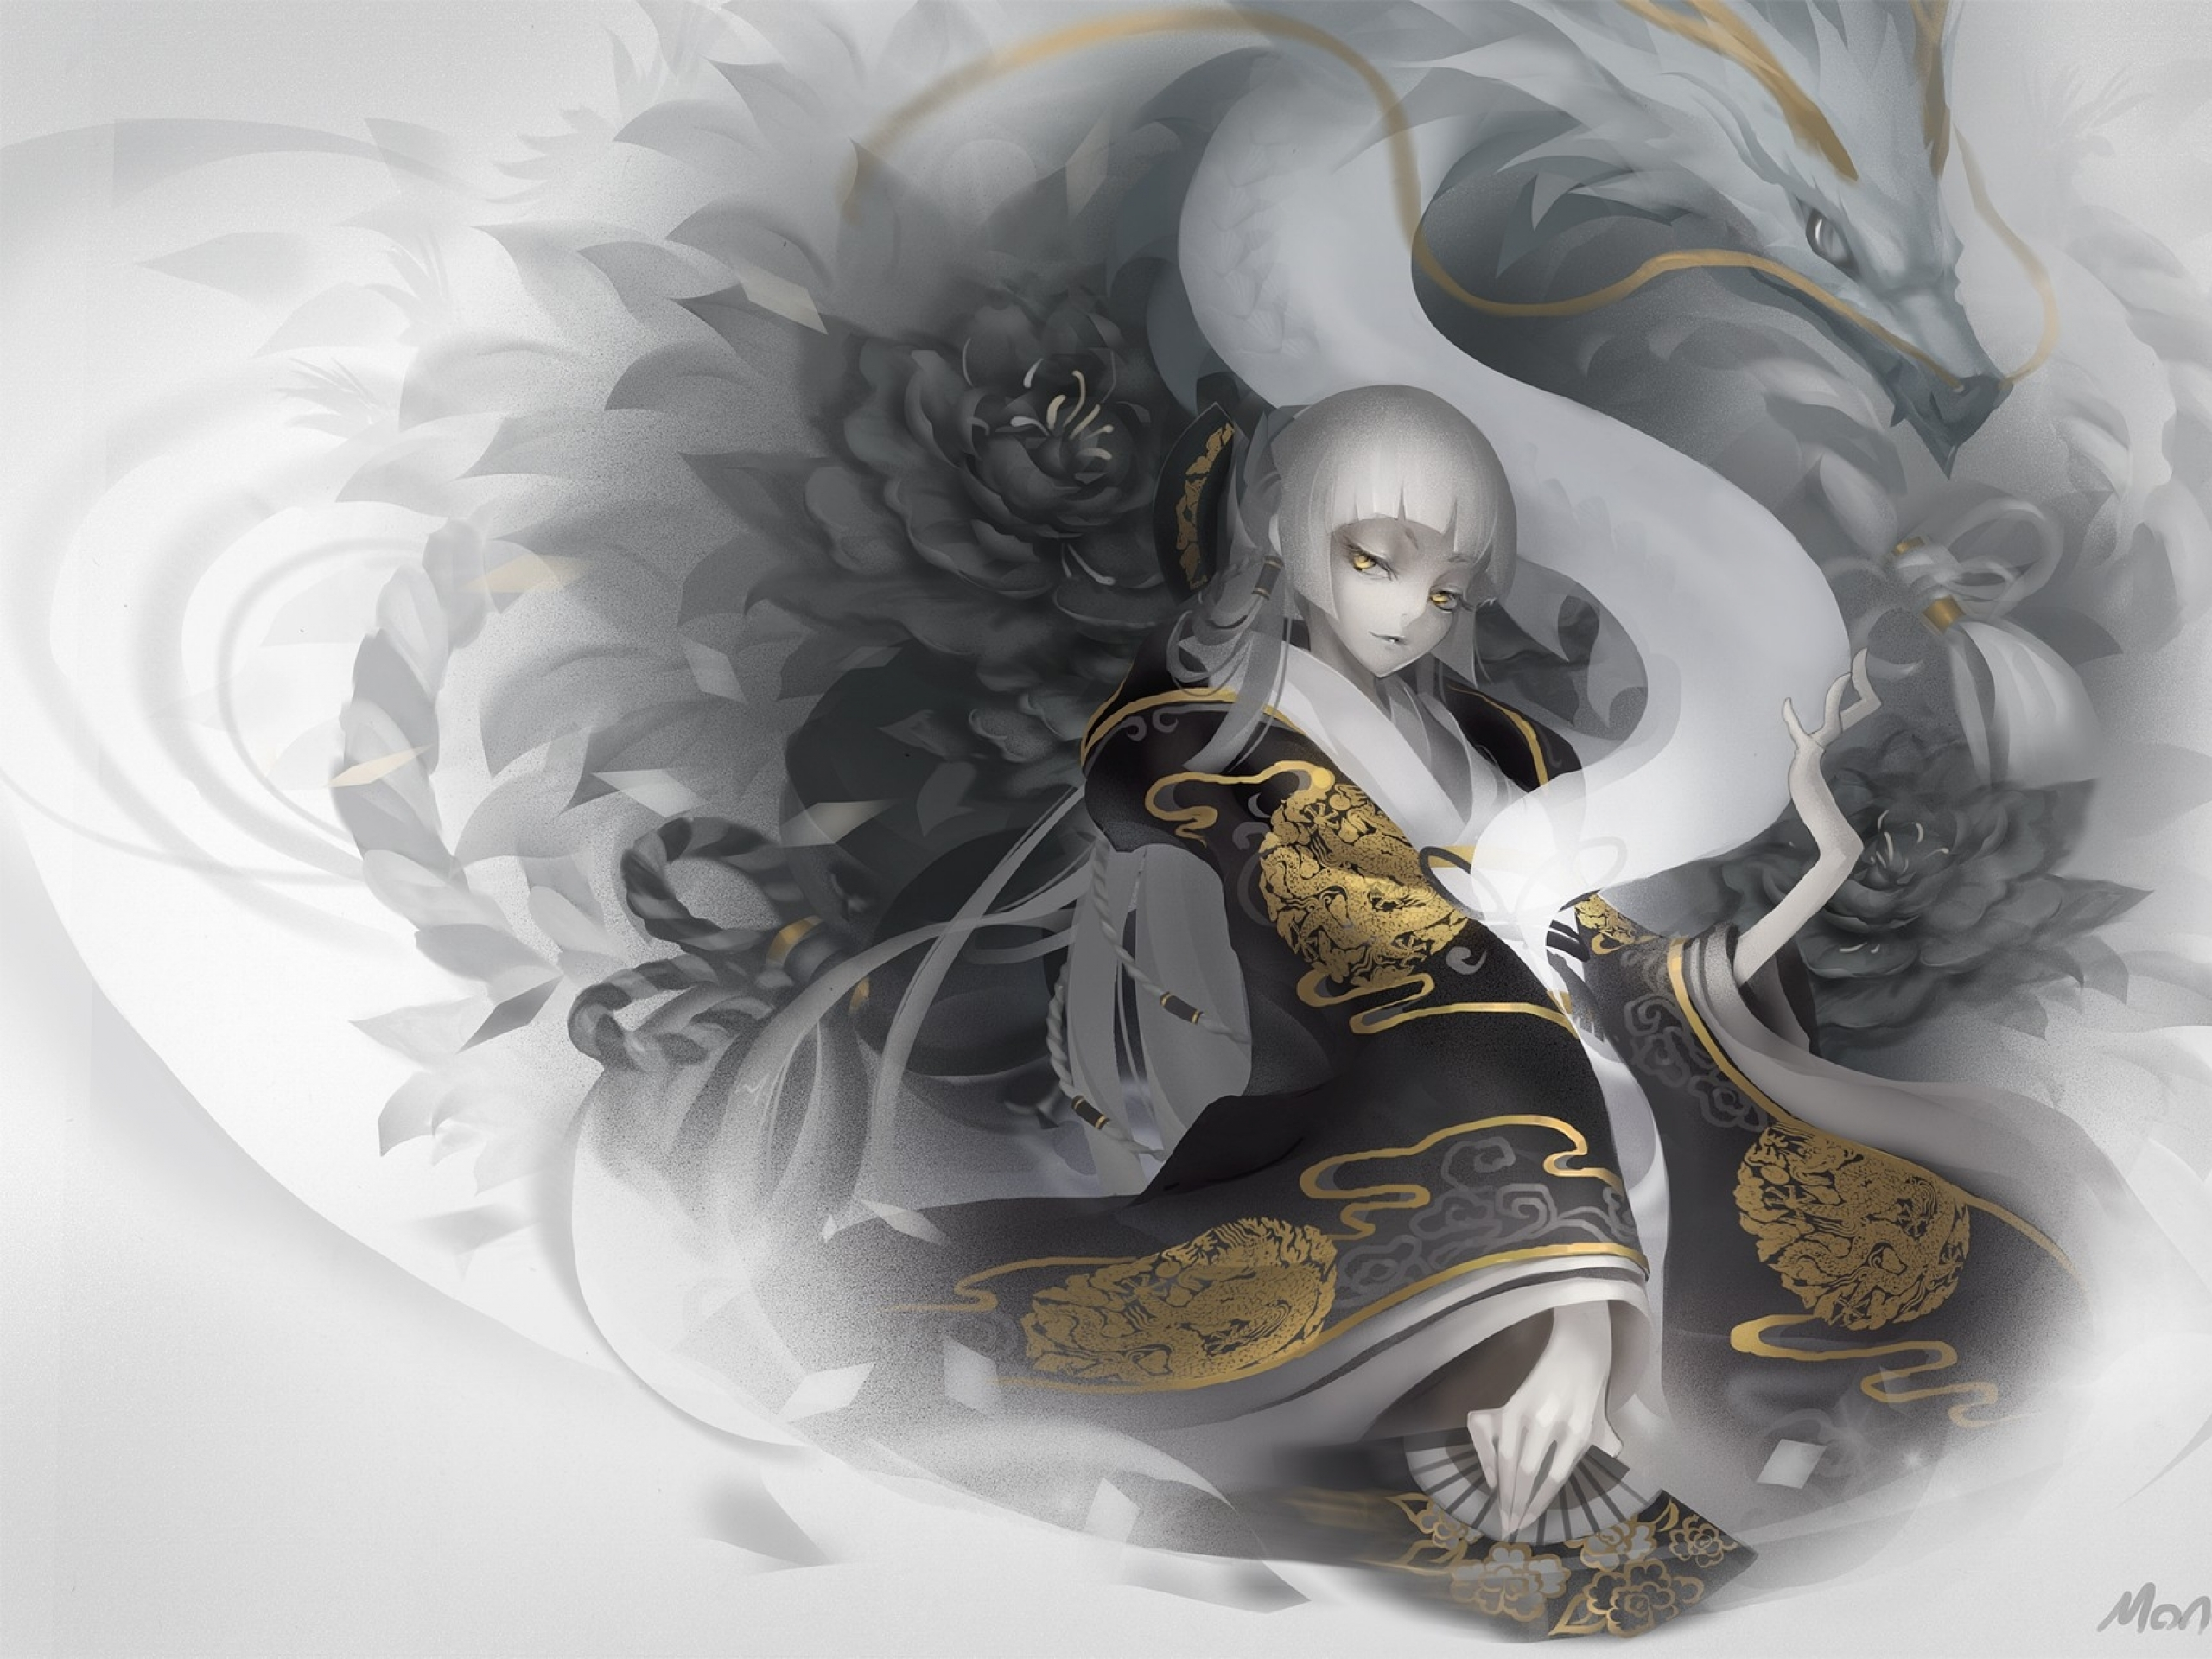 Naruto Girl Wallpaper Hd 1 Dragon Spirit Hd Wallpapers Backgrounds Wallpaper Abyss